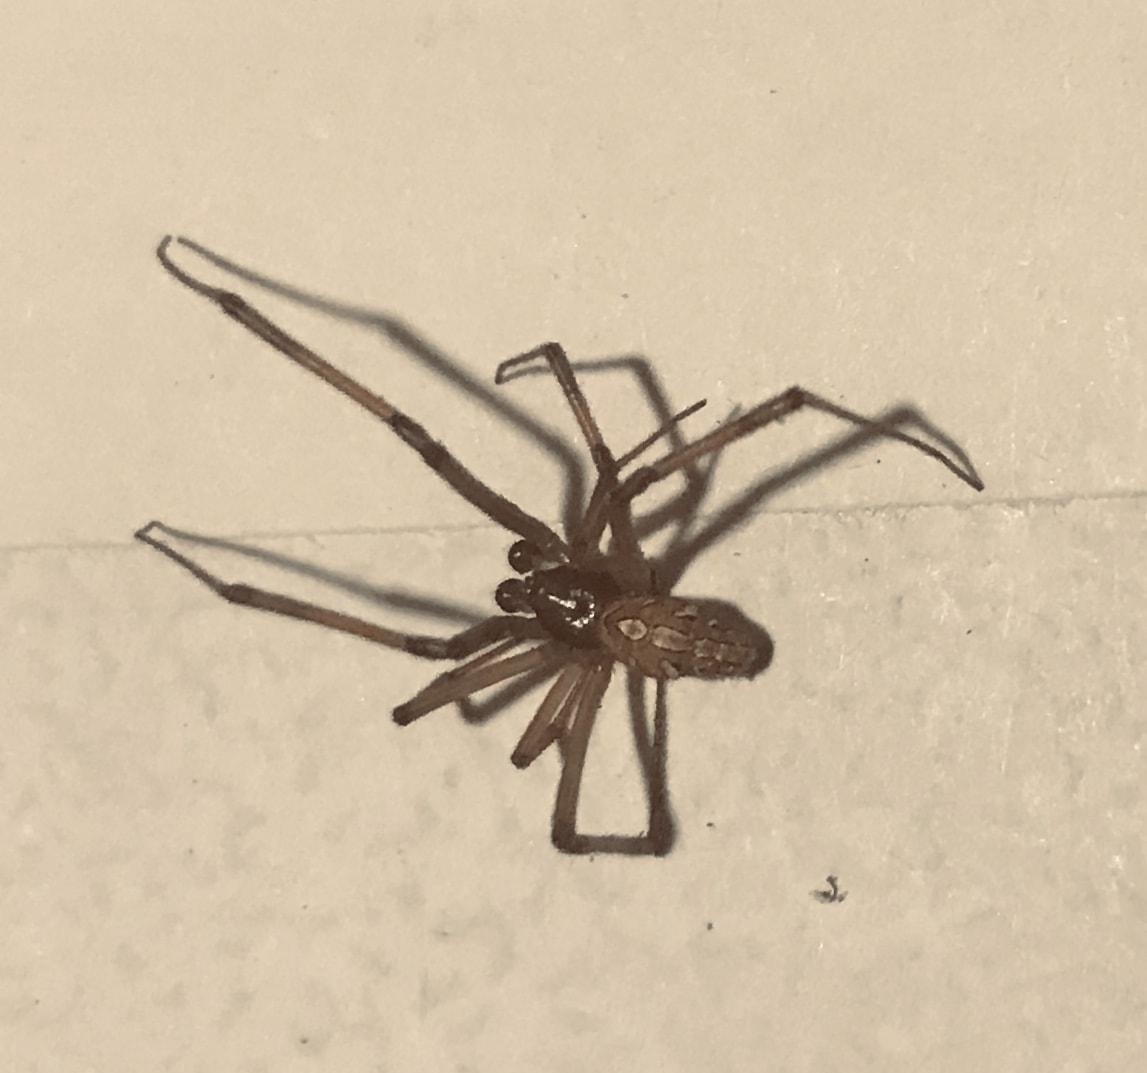 Picture of Latrodectus hesperus (Western Black Widow) - Male - Penultimate